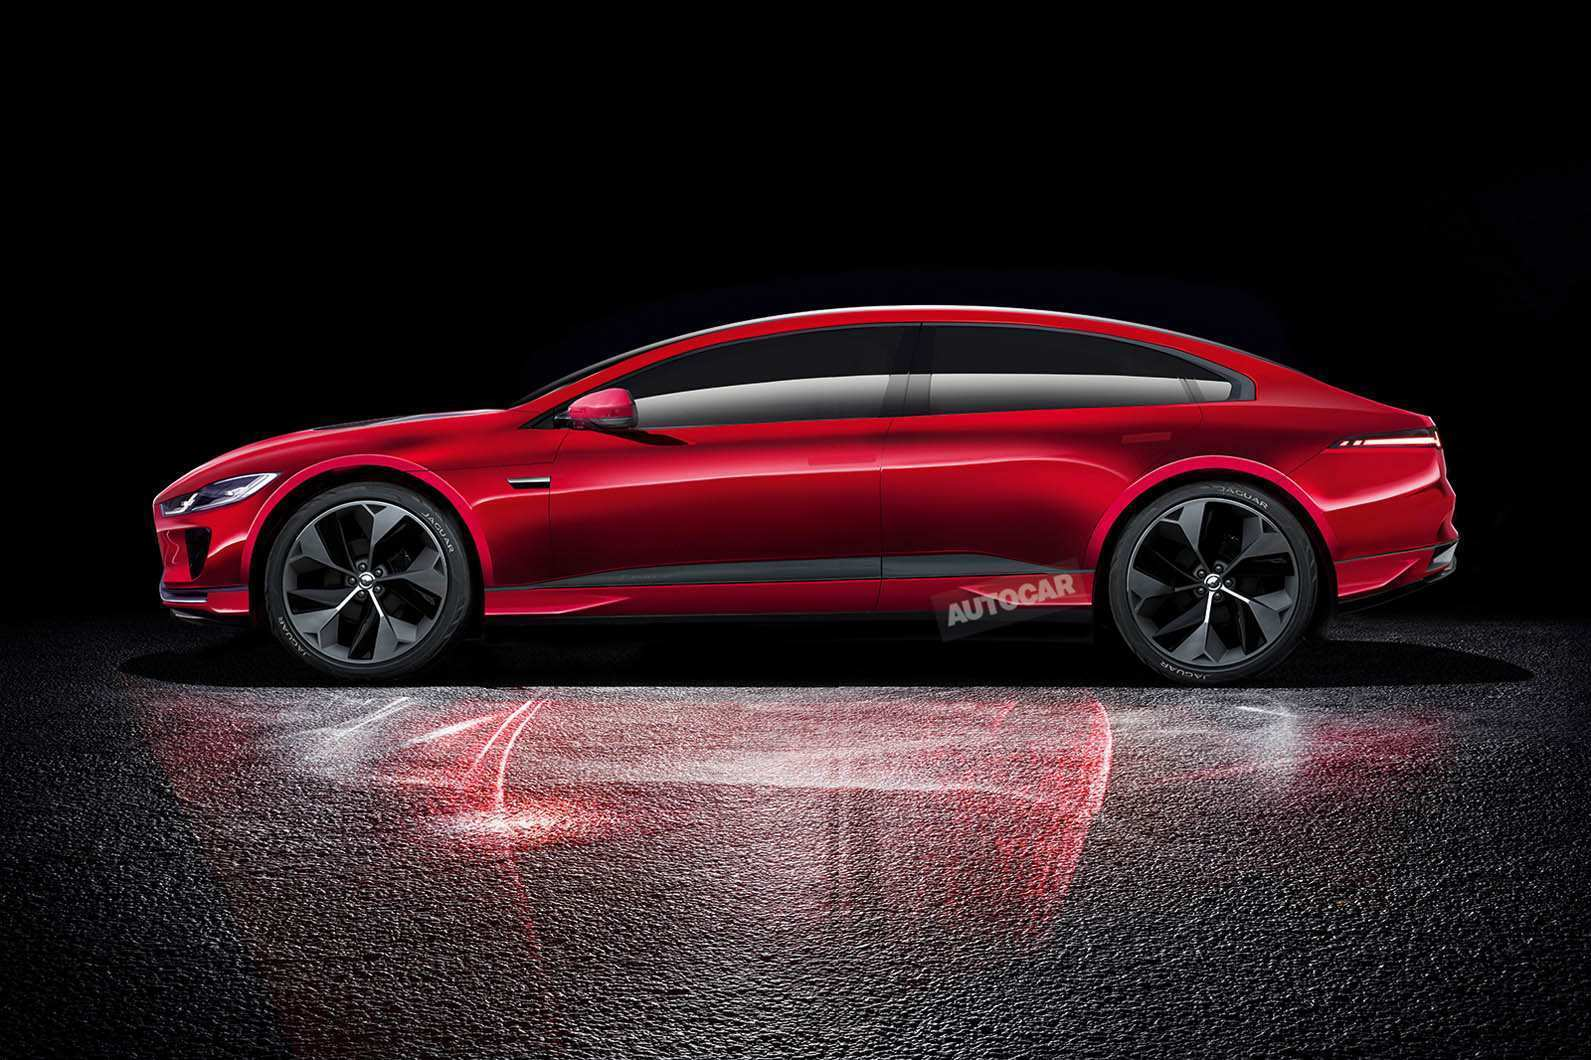 80 New New 2019 Jaguar Xj Specs and Review by New 2019 Jaguar Xj